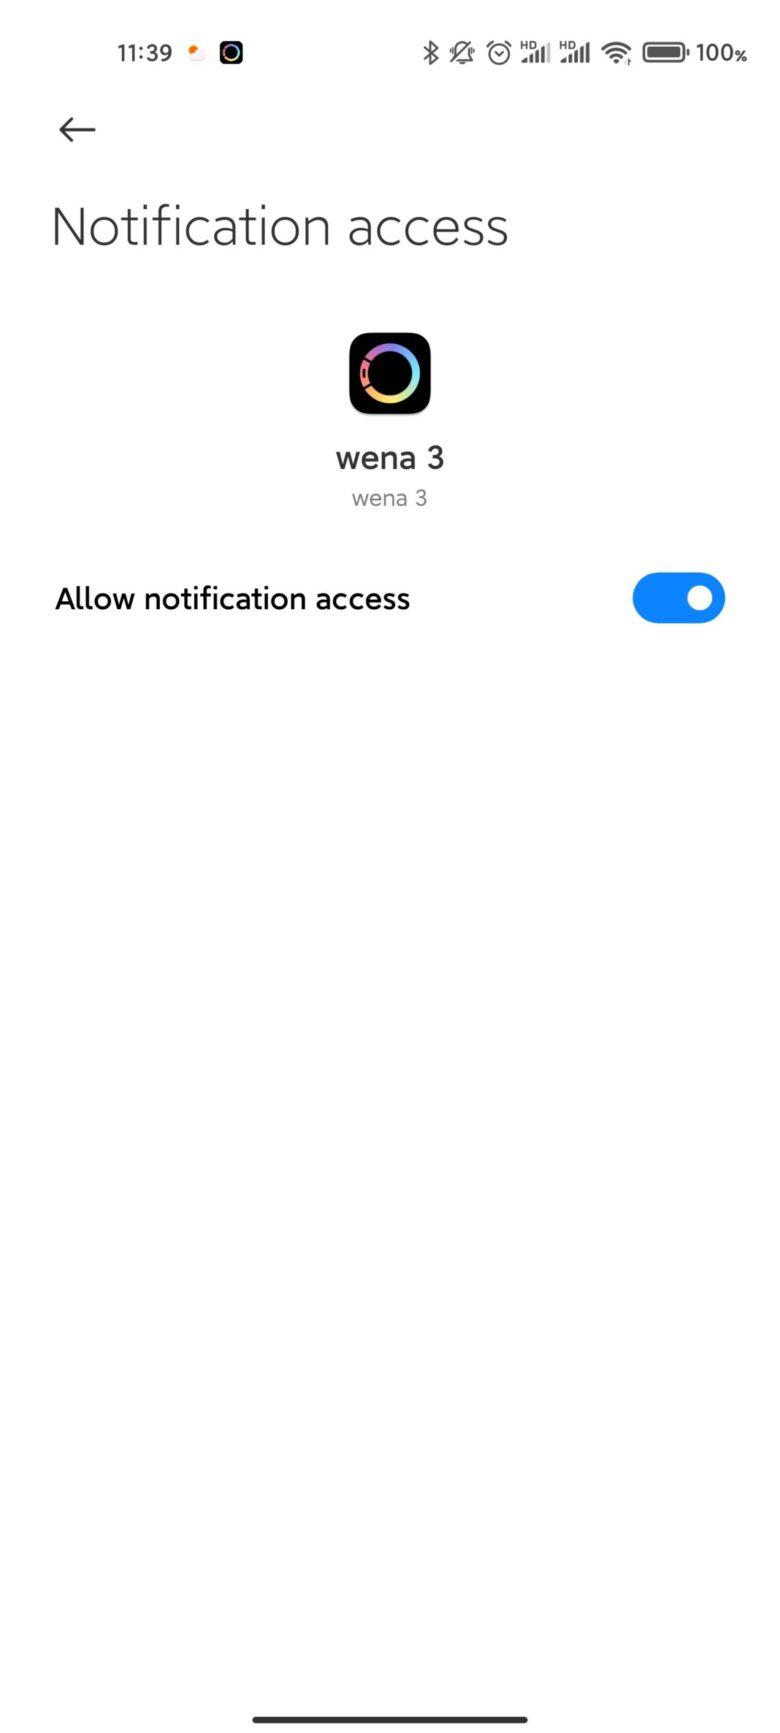 Xiaomi Mi11 Ultraの通知設定について。 Wena3の通知アクセスを有効化。